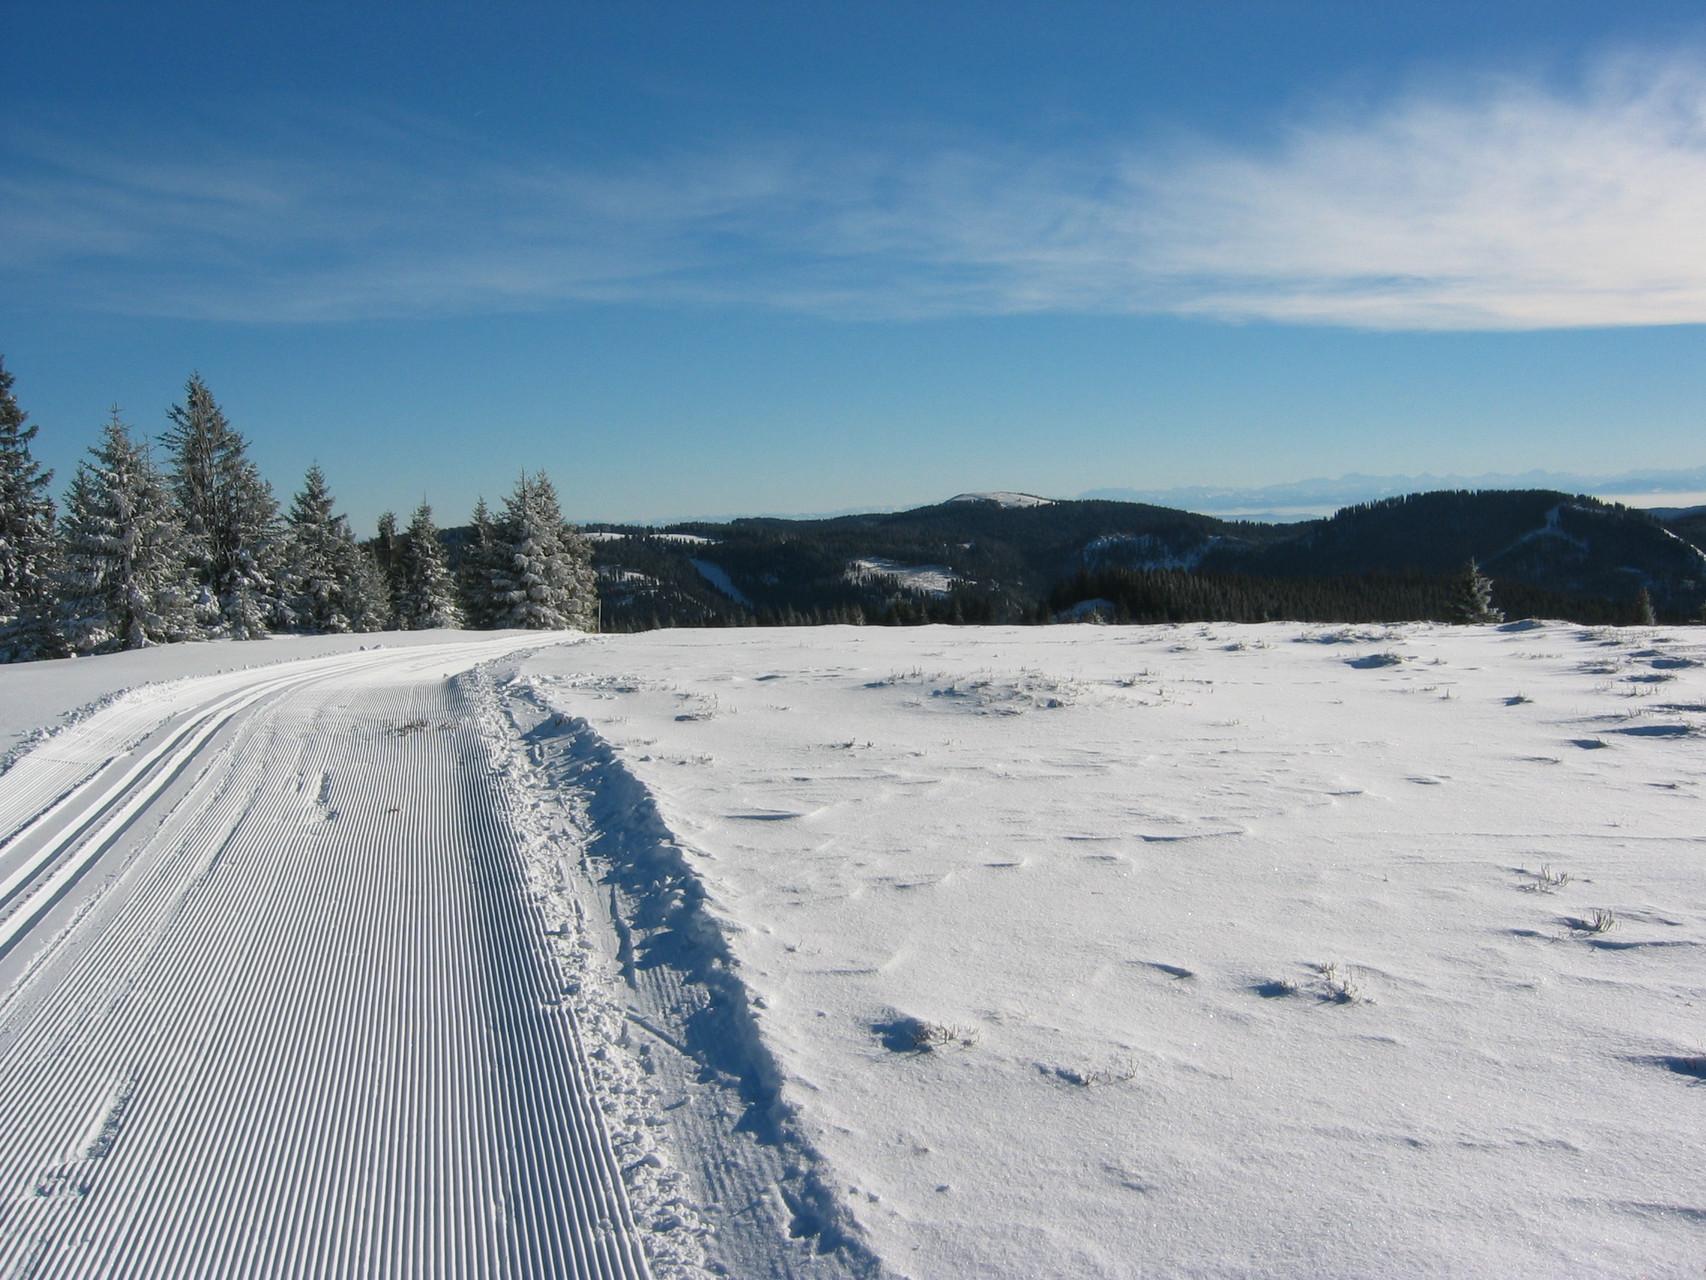 Top Langlauf-Loipen in der Umgebung